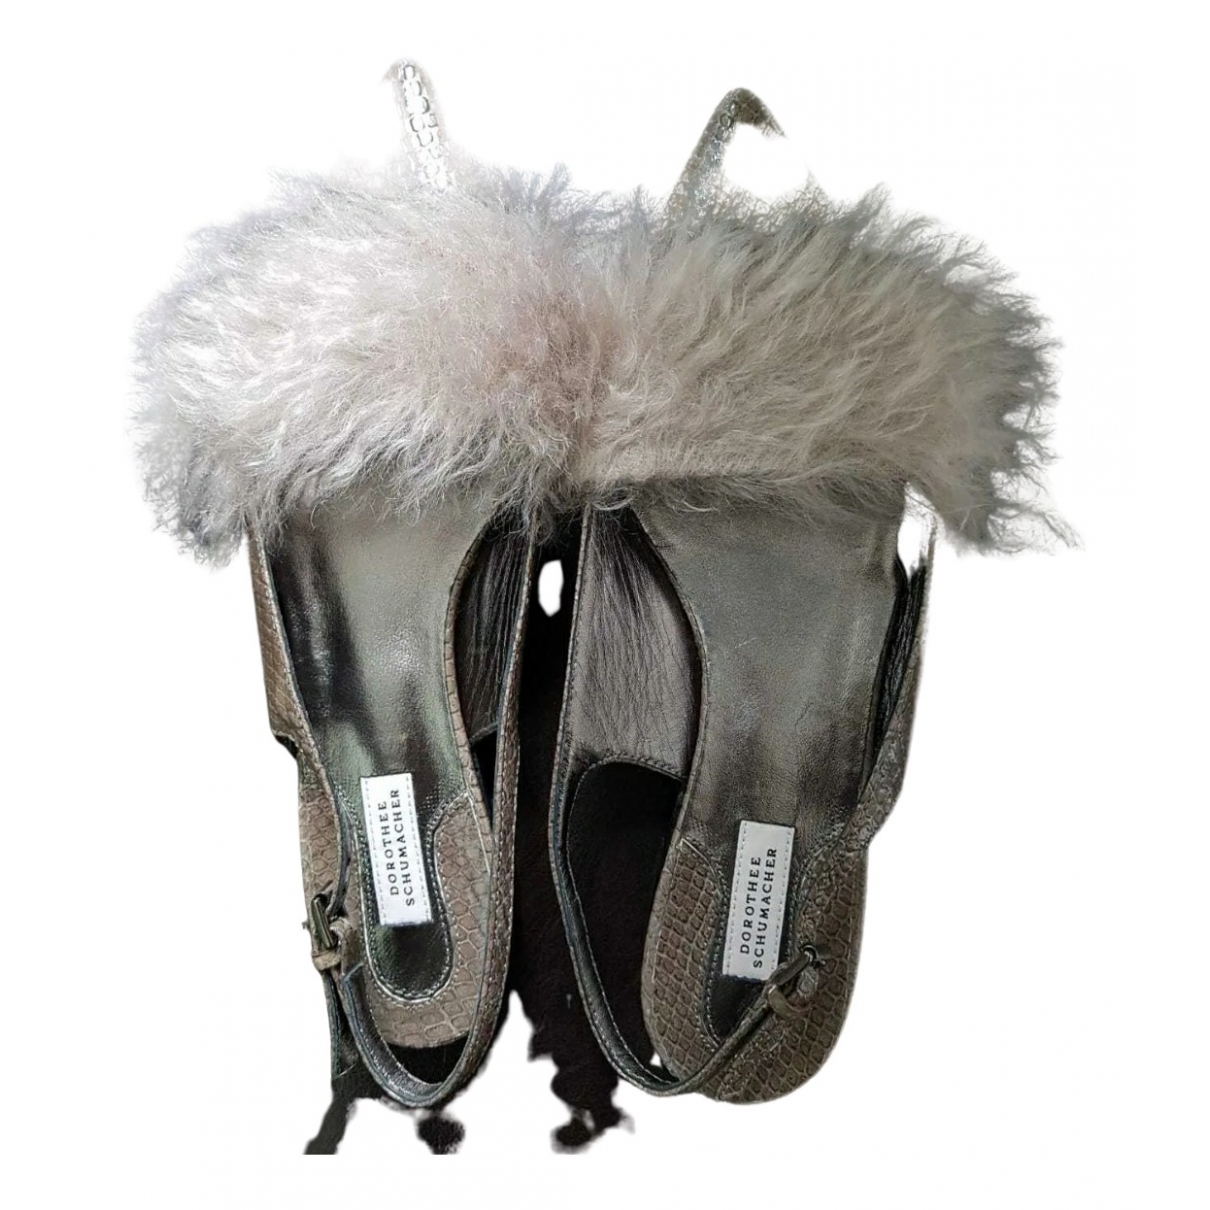 Dorothee Schumacher N Leather Flats for Women 37.5 EU